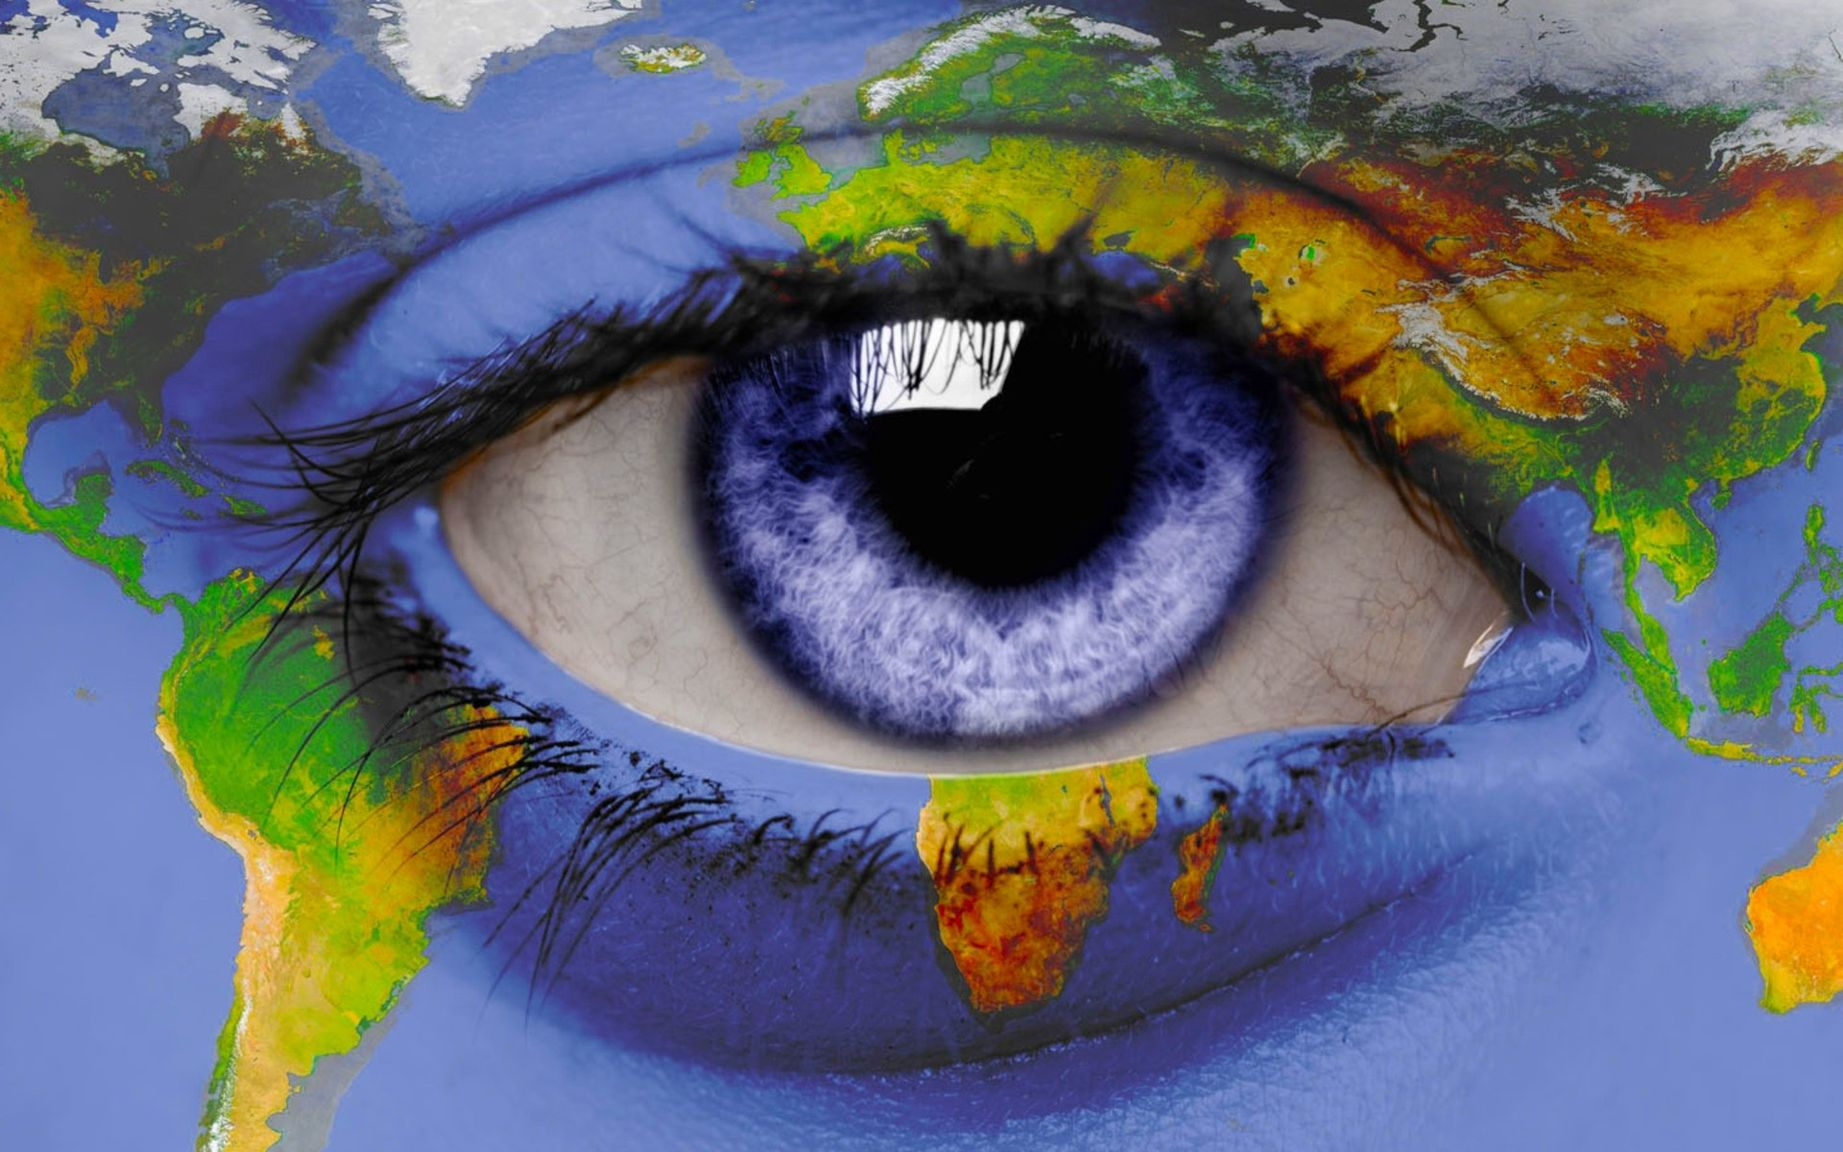 Фото на тему мир глазами ван гога узкий среди